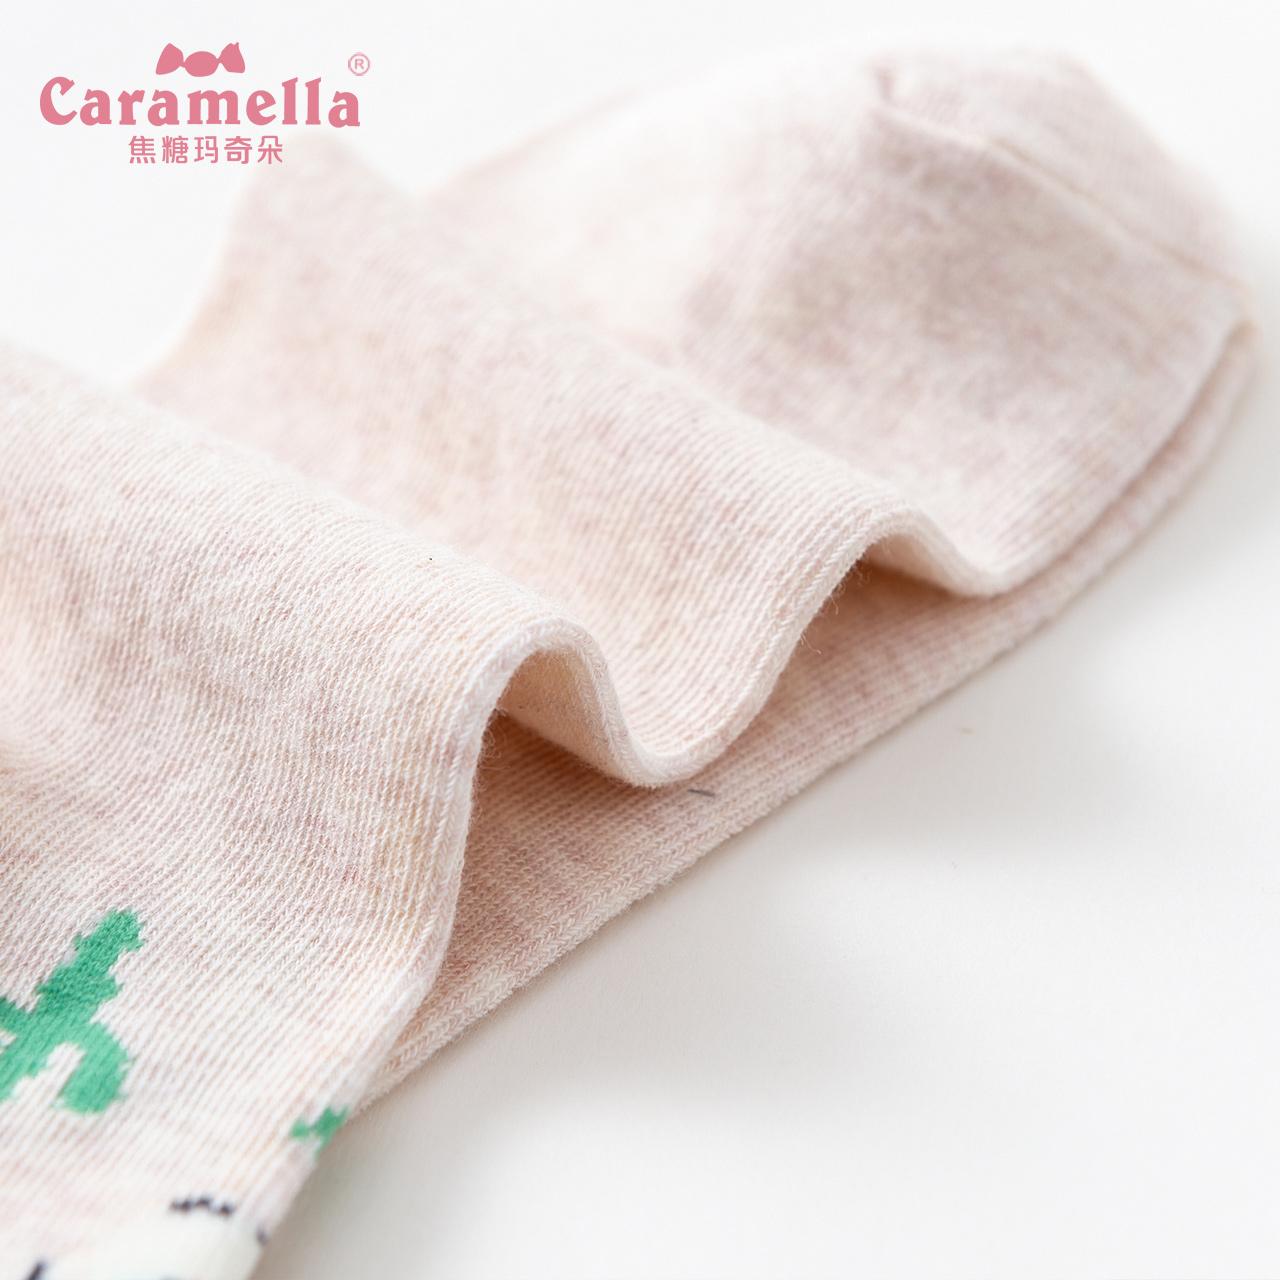 CARAMELLA潮流可爱卡通防臭加厚棉袜子女ins潮秋冬中长筒鼠年袜子